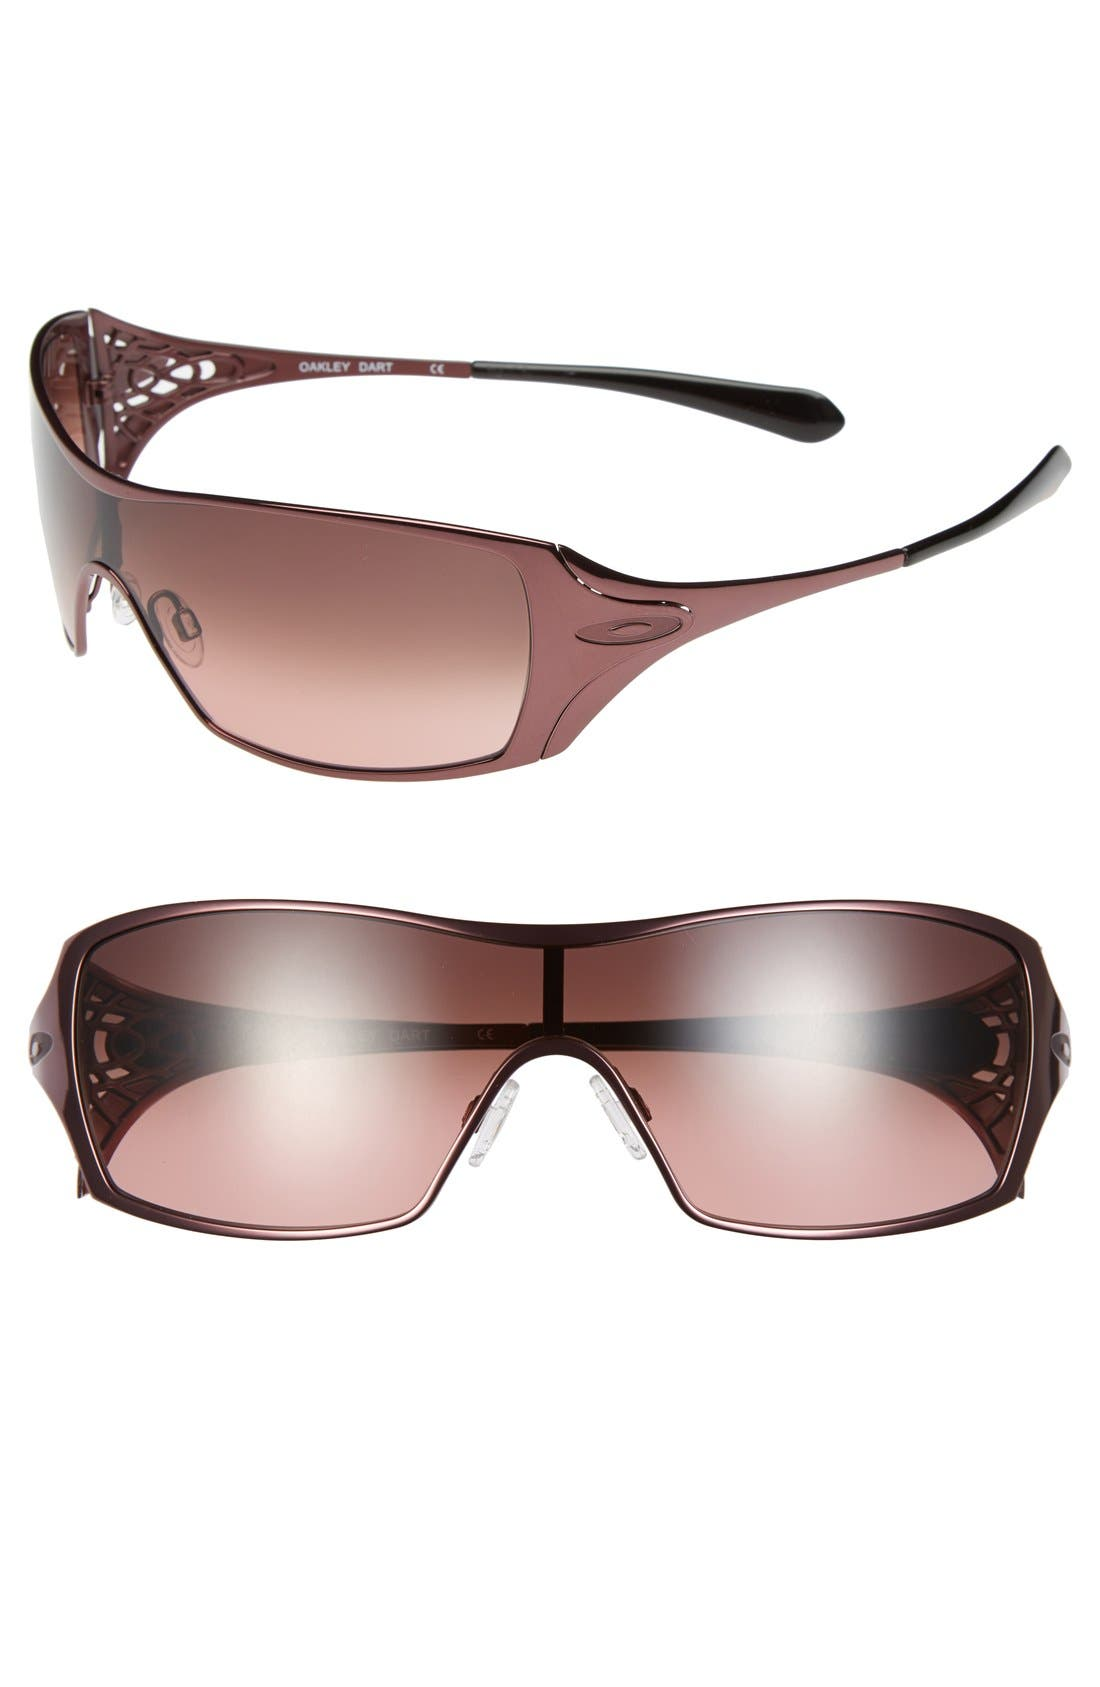 Main Image - Oakley 'Dart' Shield Sunglasses